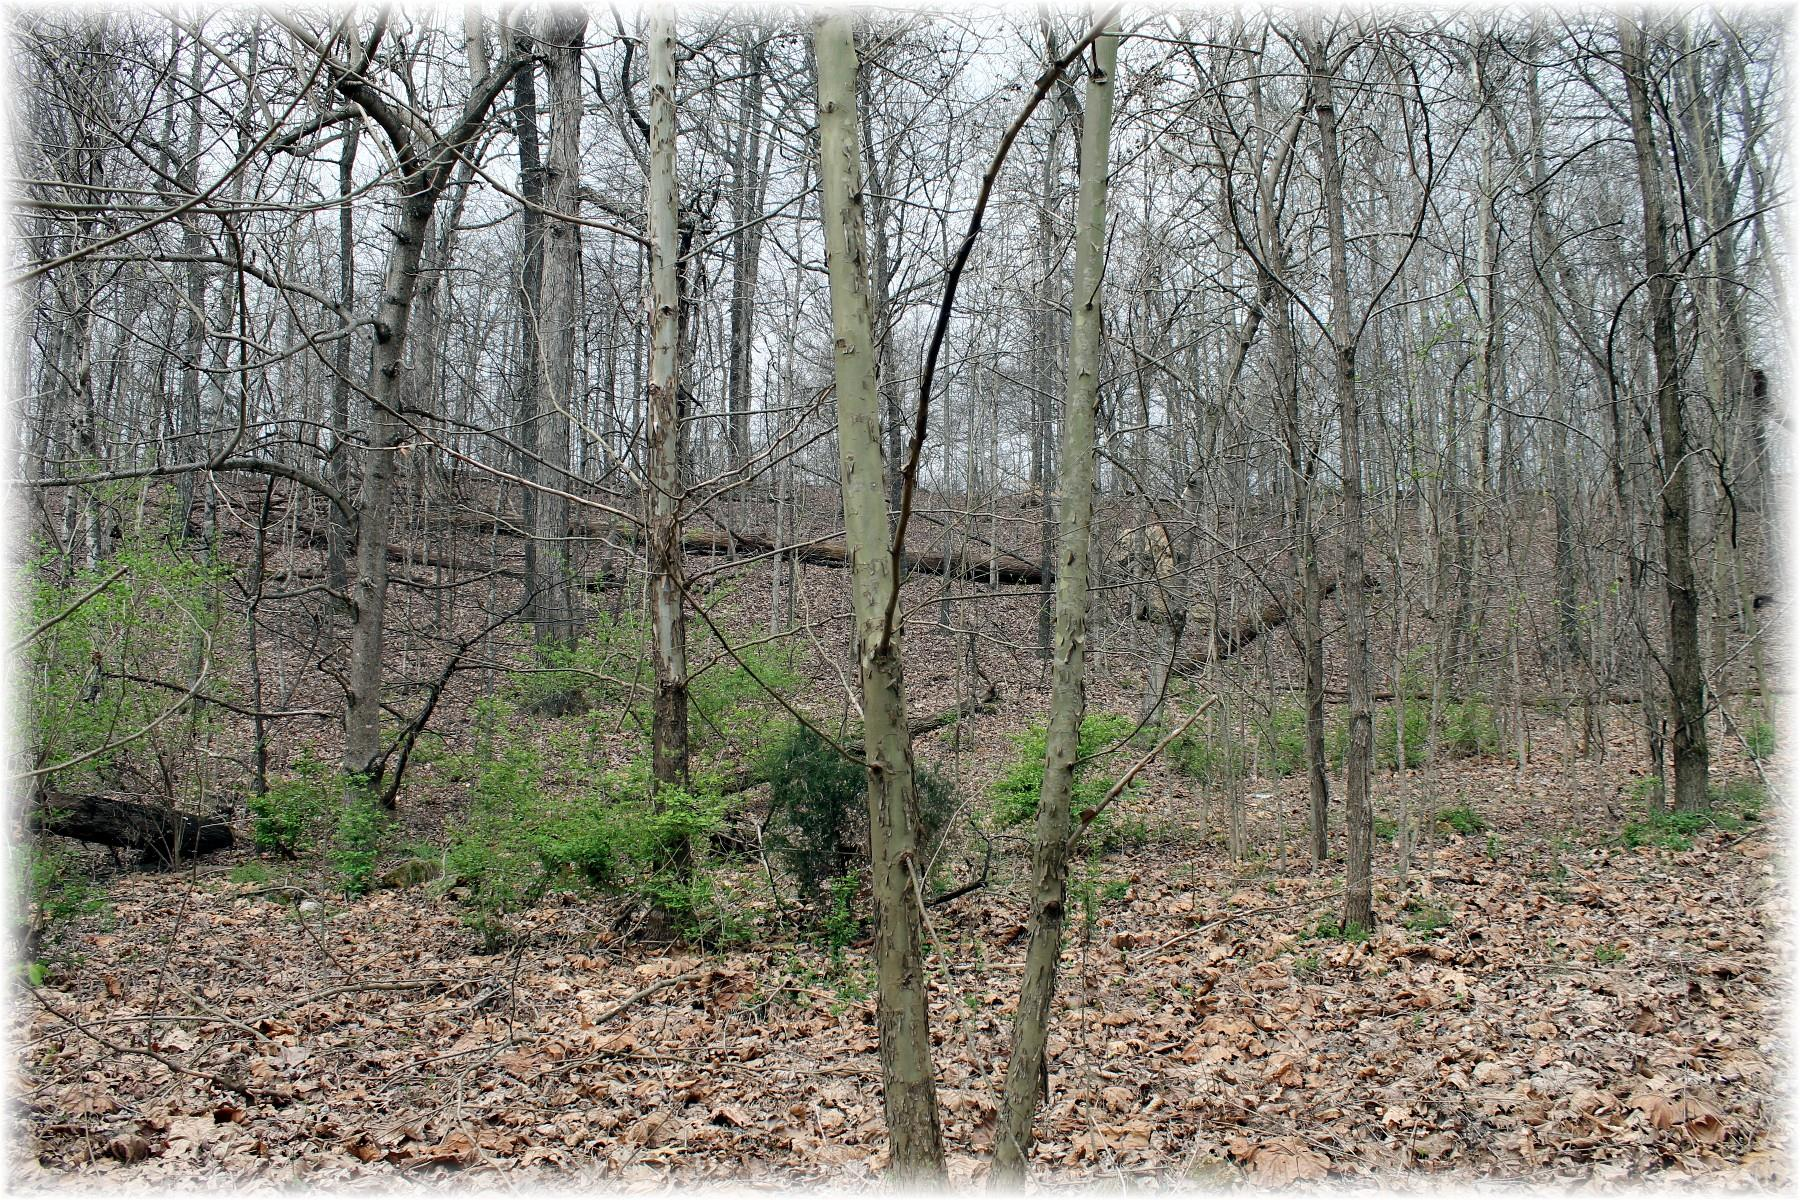 8000 Old Harding Pike, Nashville TN 37221 - Photo 1